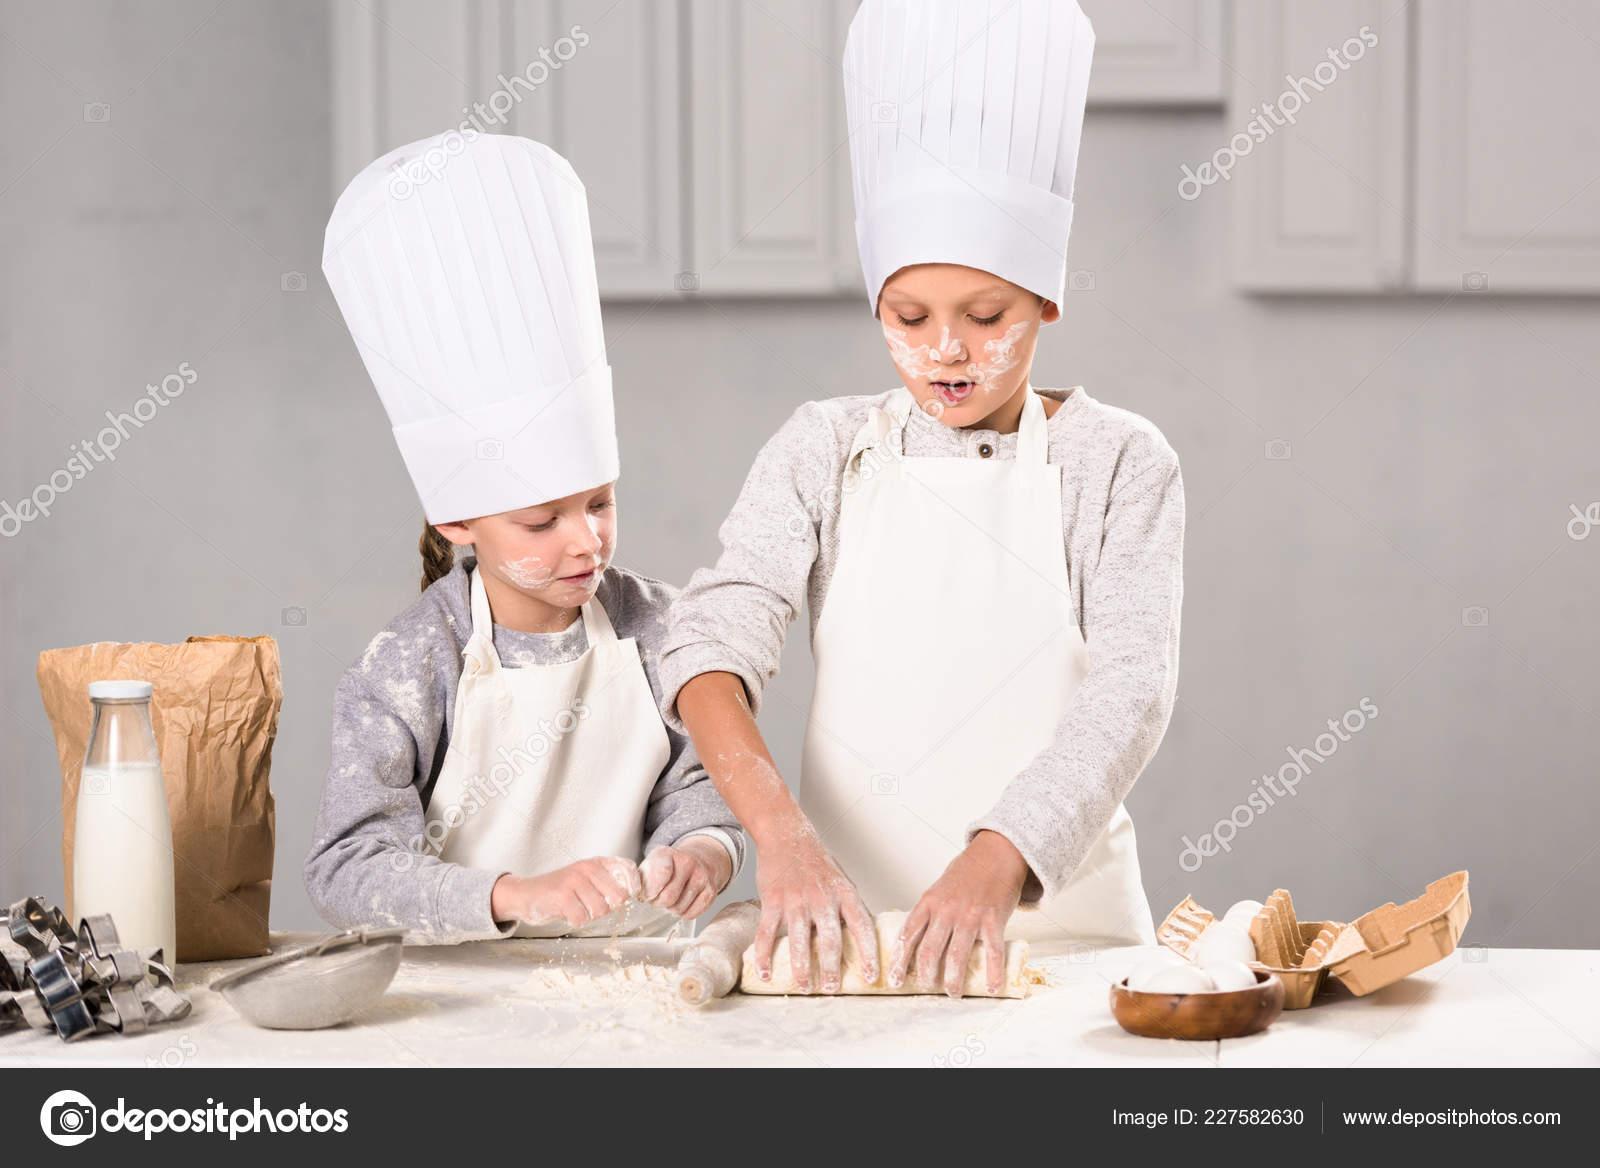 kitchen apron for kids mixer reviews 专注的孩子在围裙和厨师帽与滚针面团在厨房的桌子 图库照片